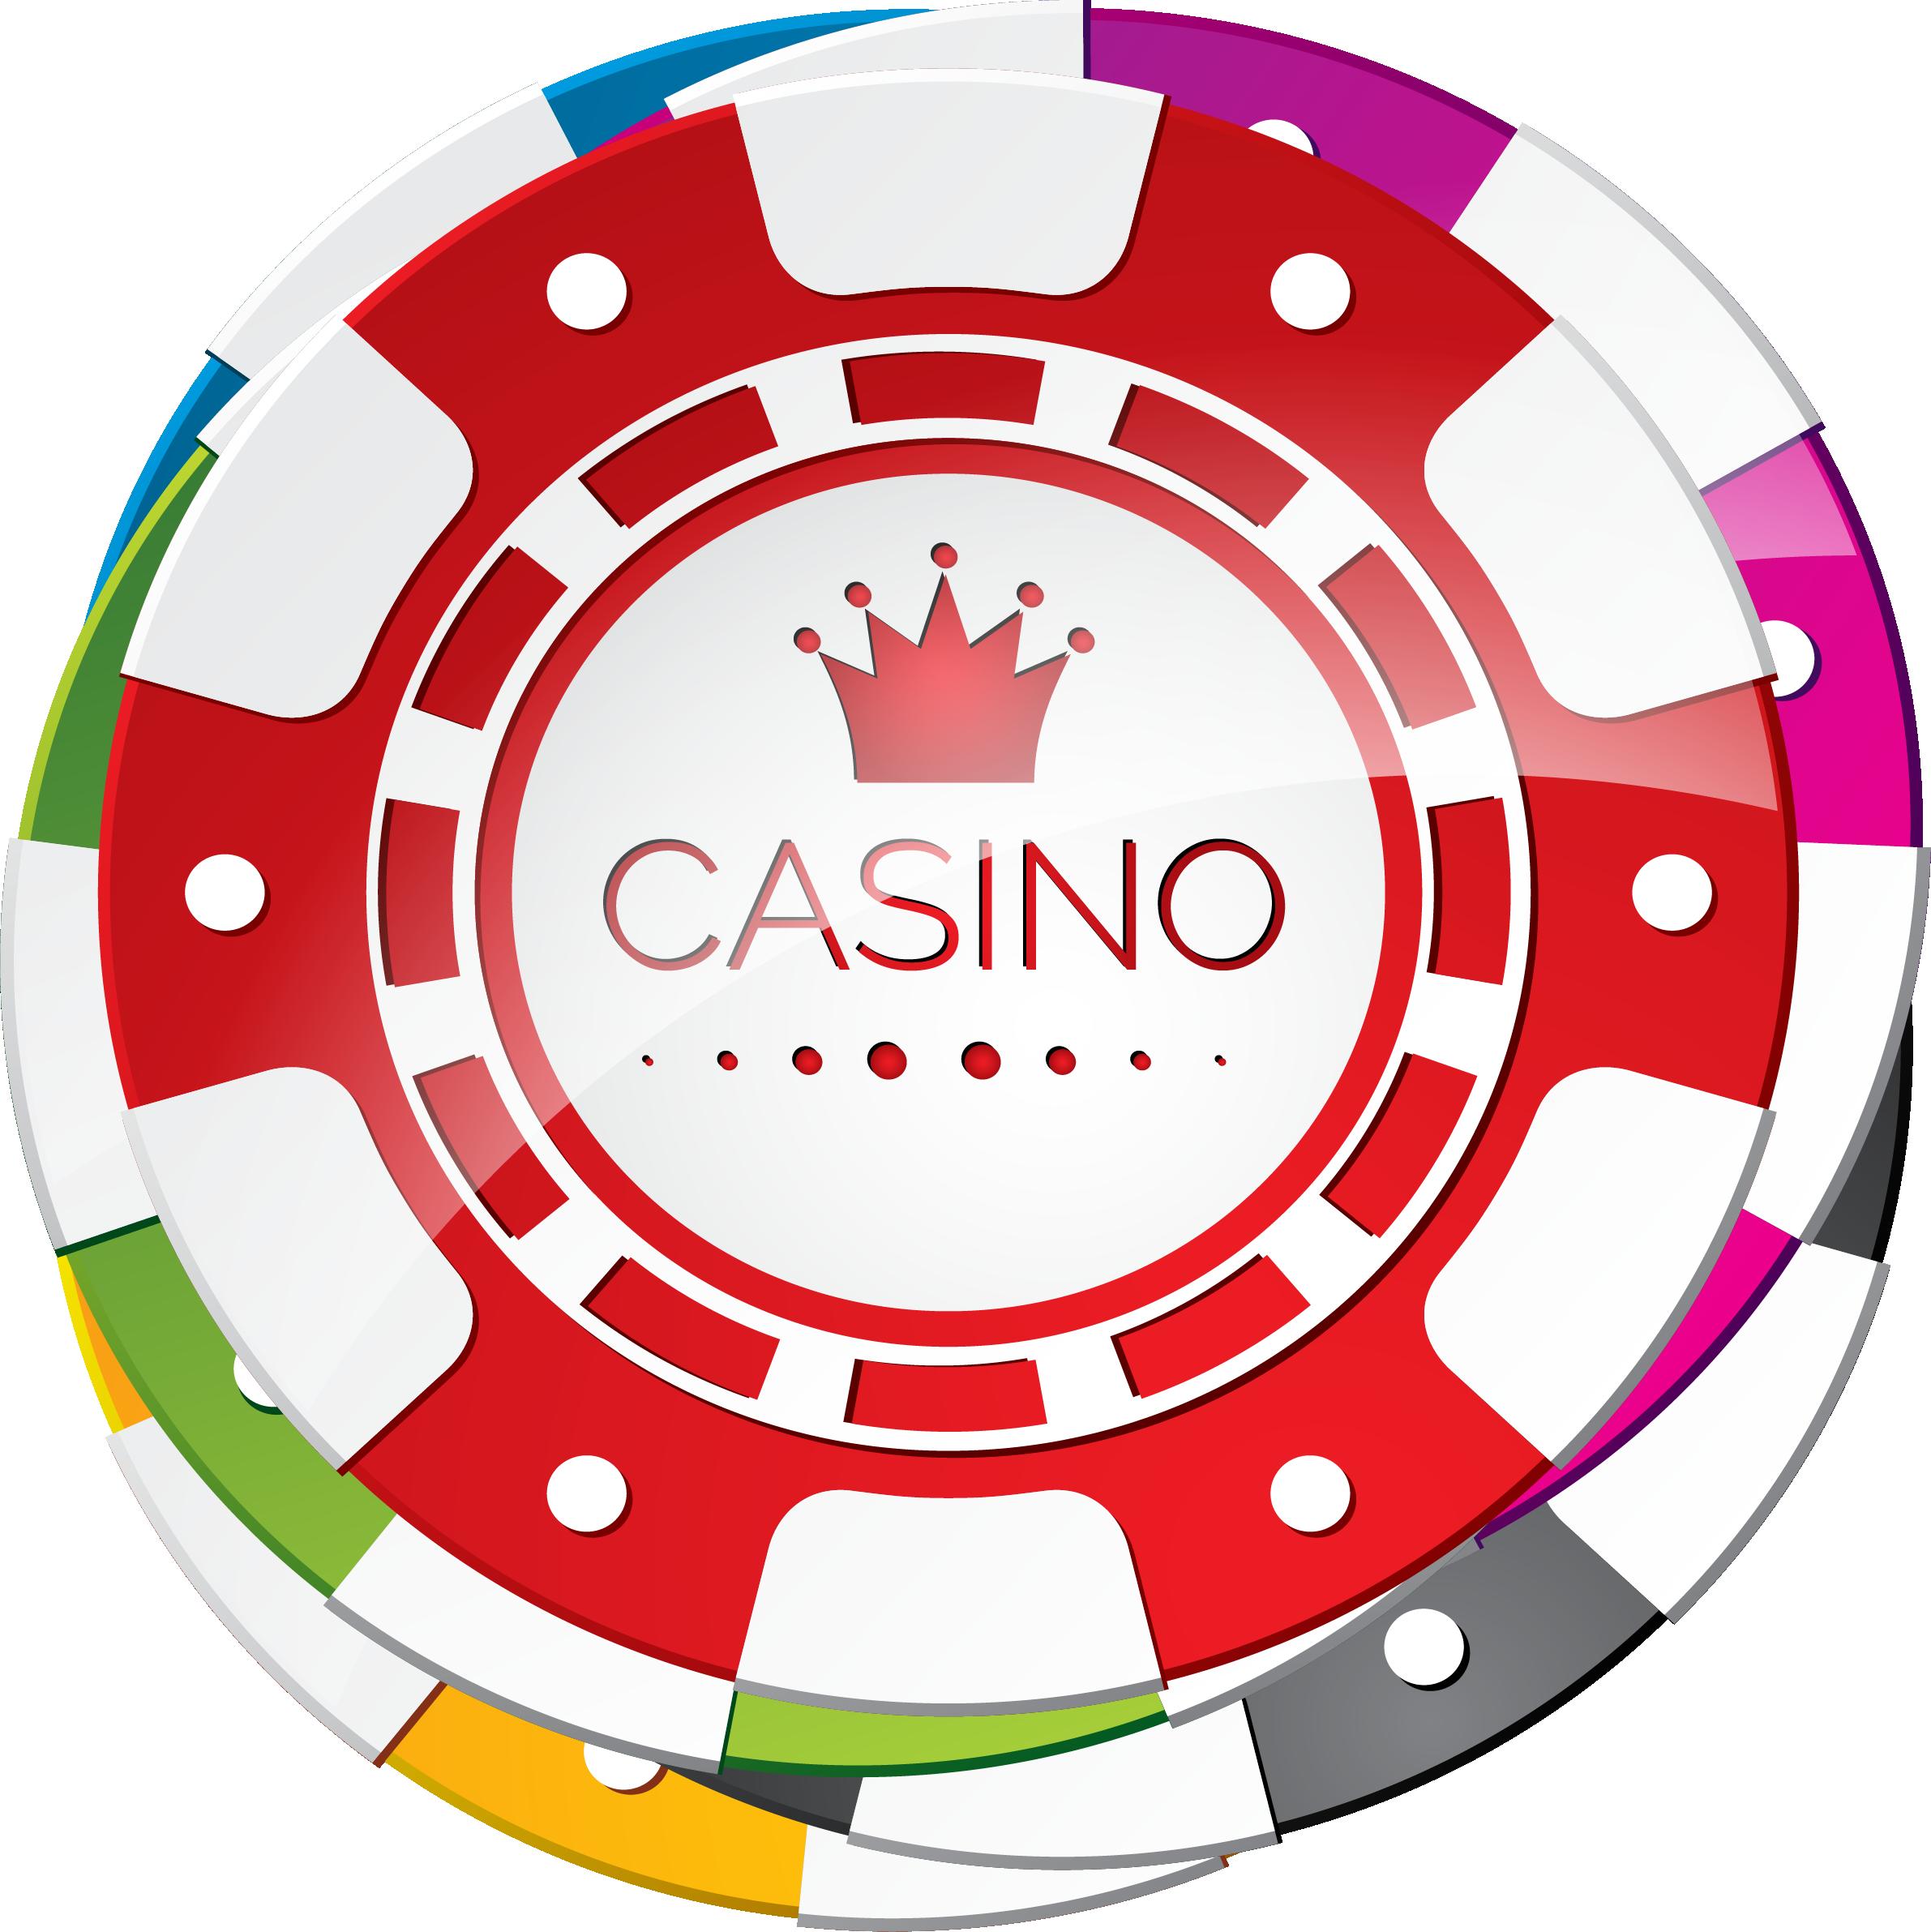 Blackjack casino token roulette. Dice clipart different color